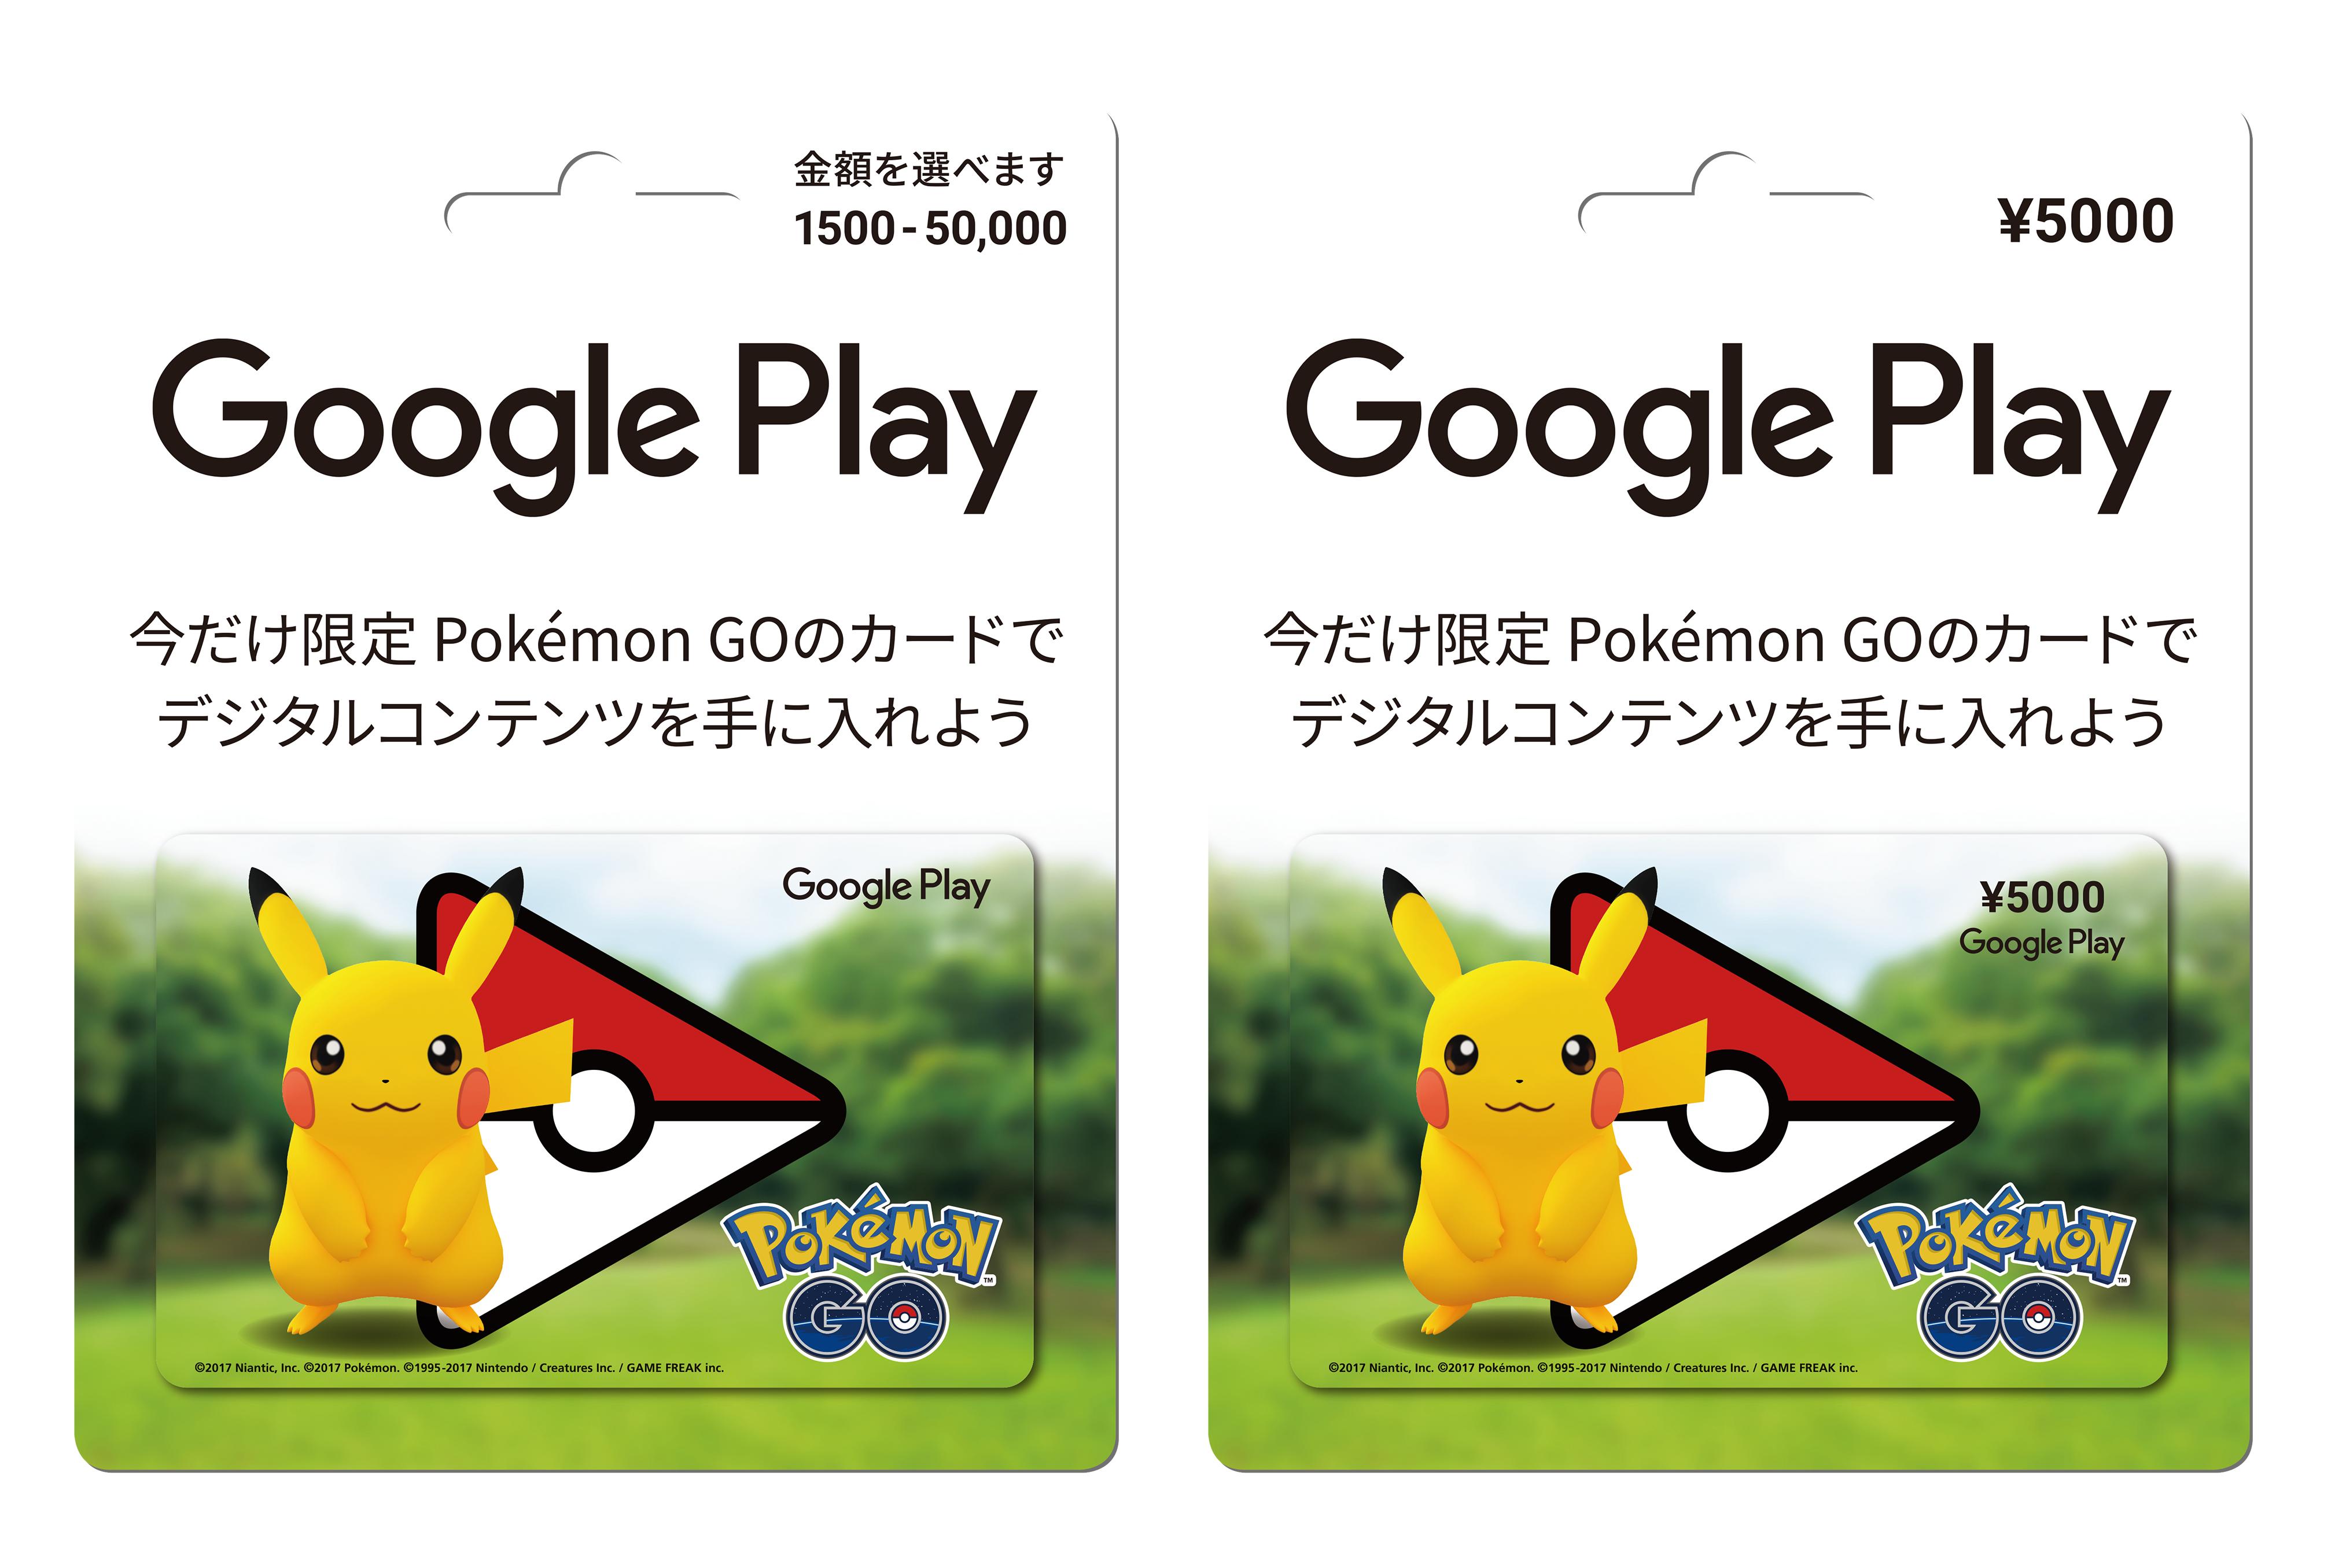 pokémon go』デザインの google play ギフトカードが発売中!|『pokémon